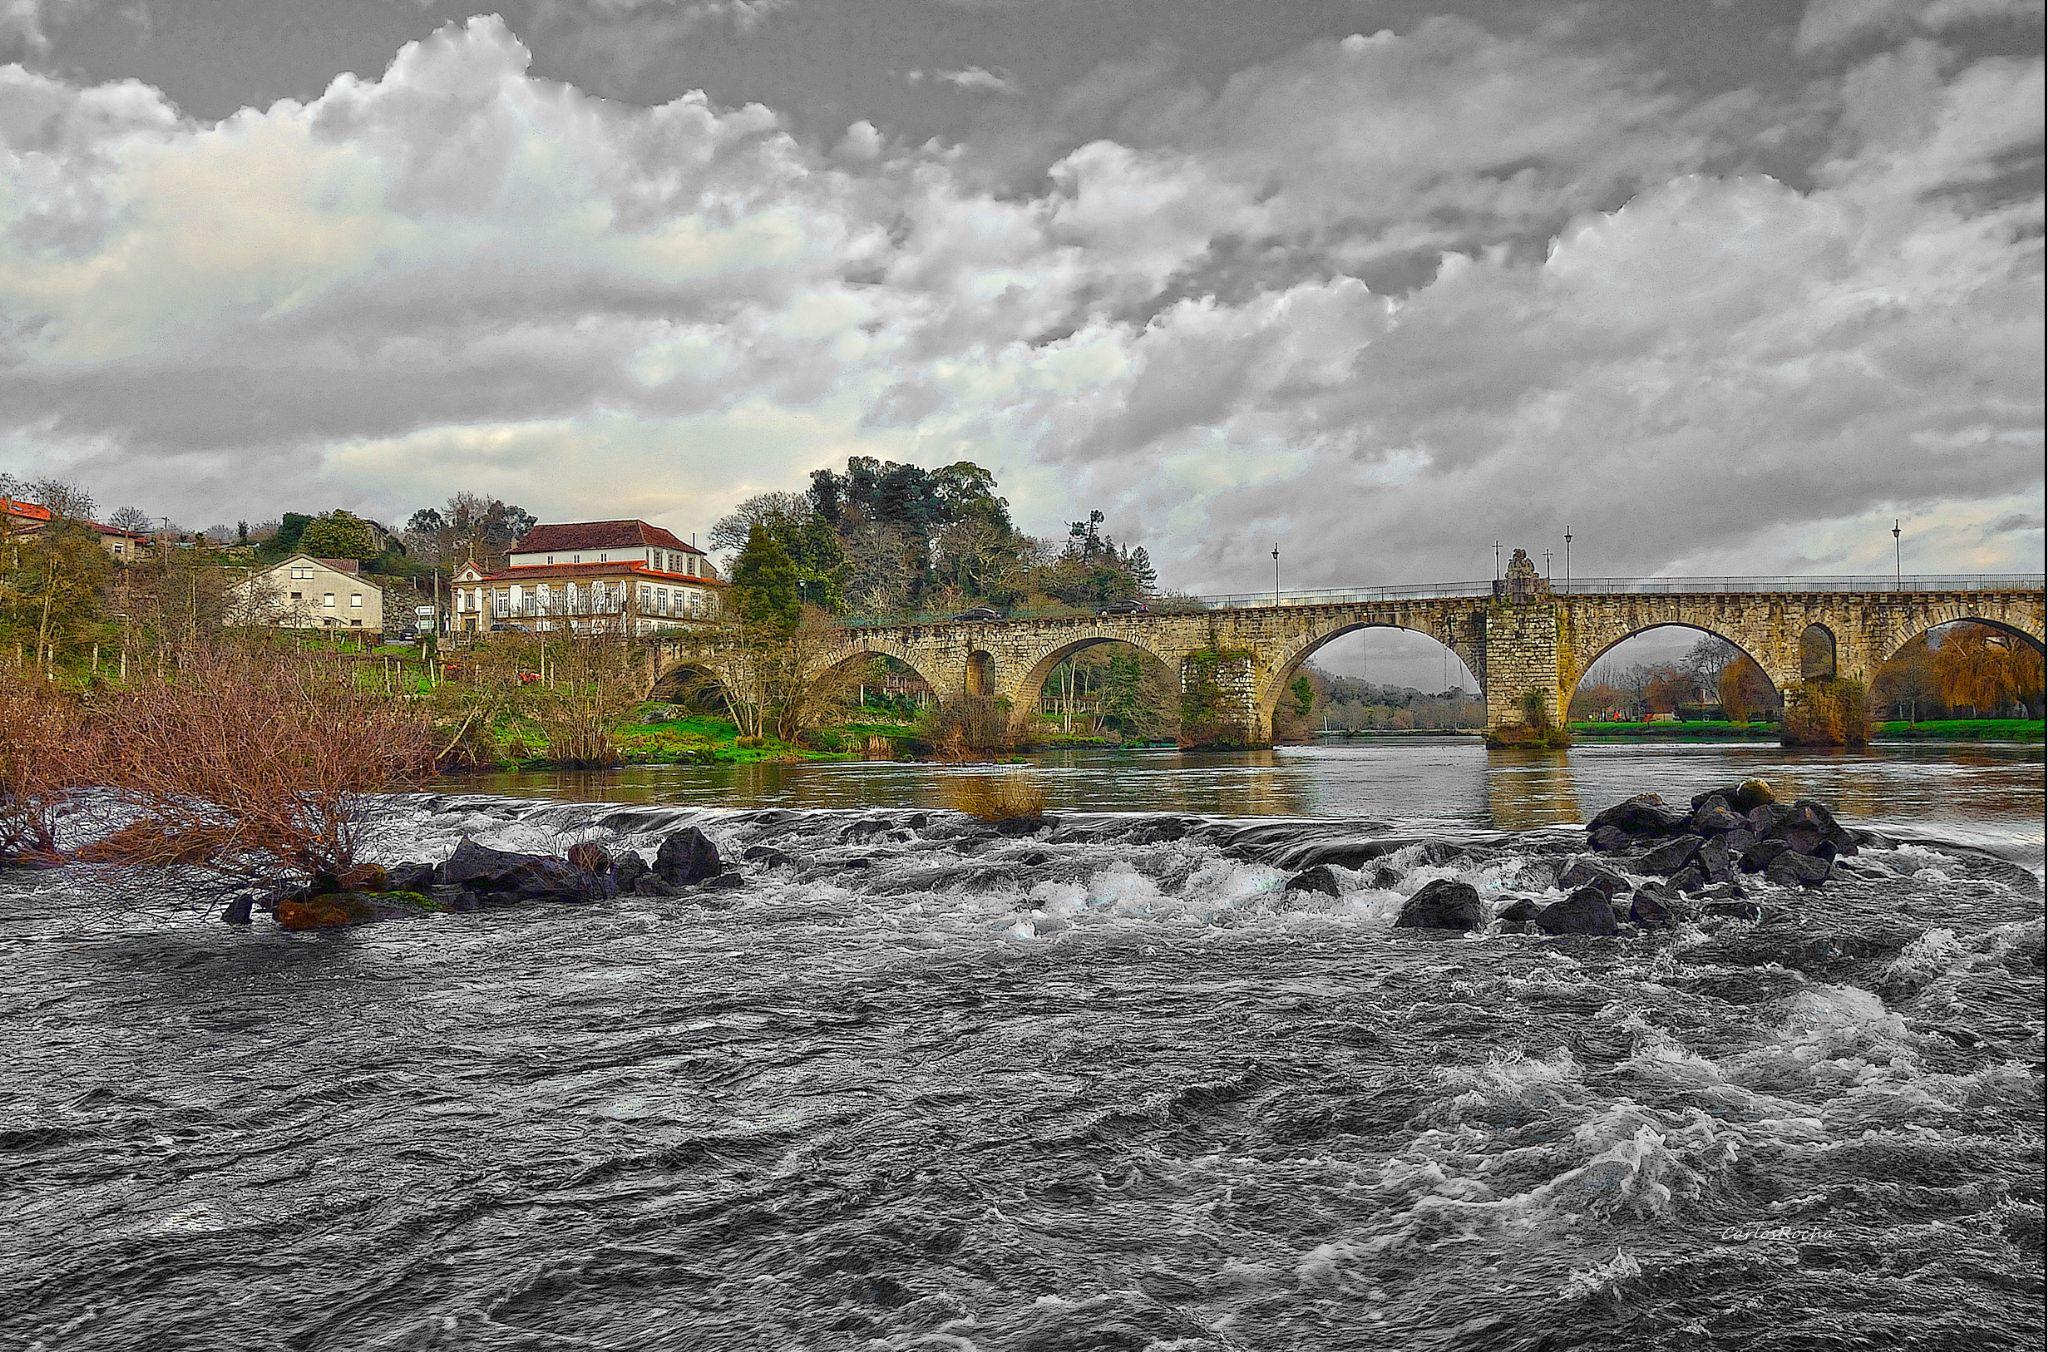 Ponte da Barca by carlosfiuzar